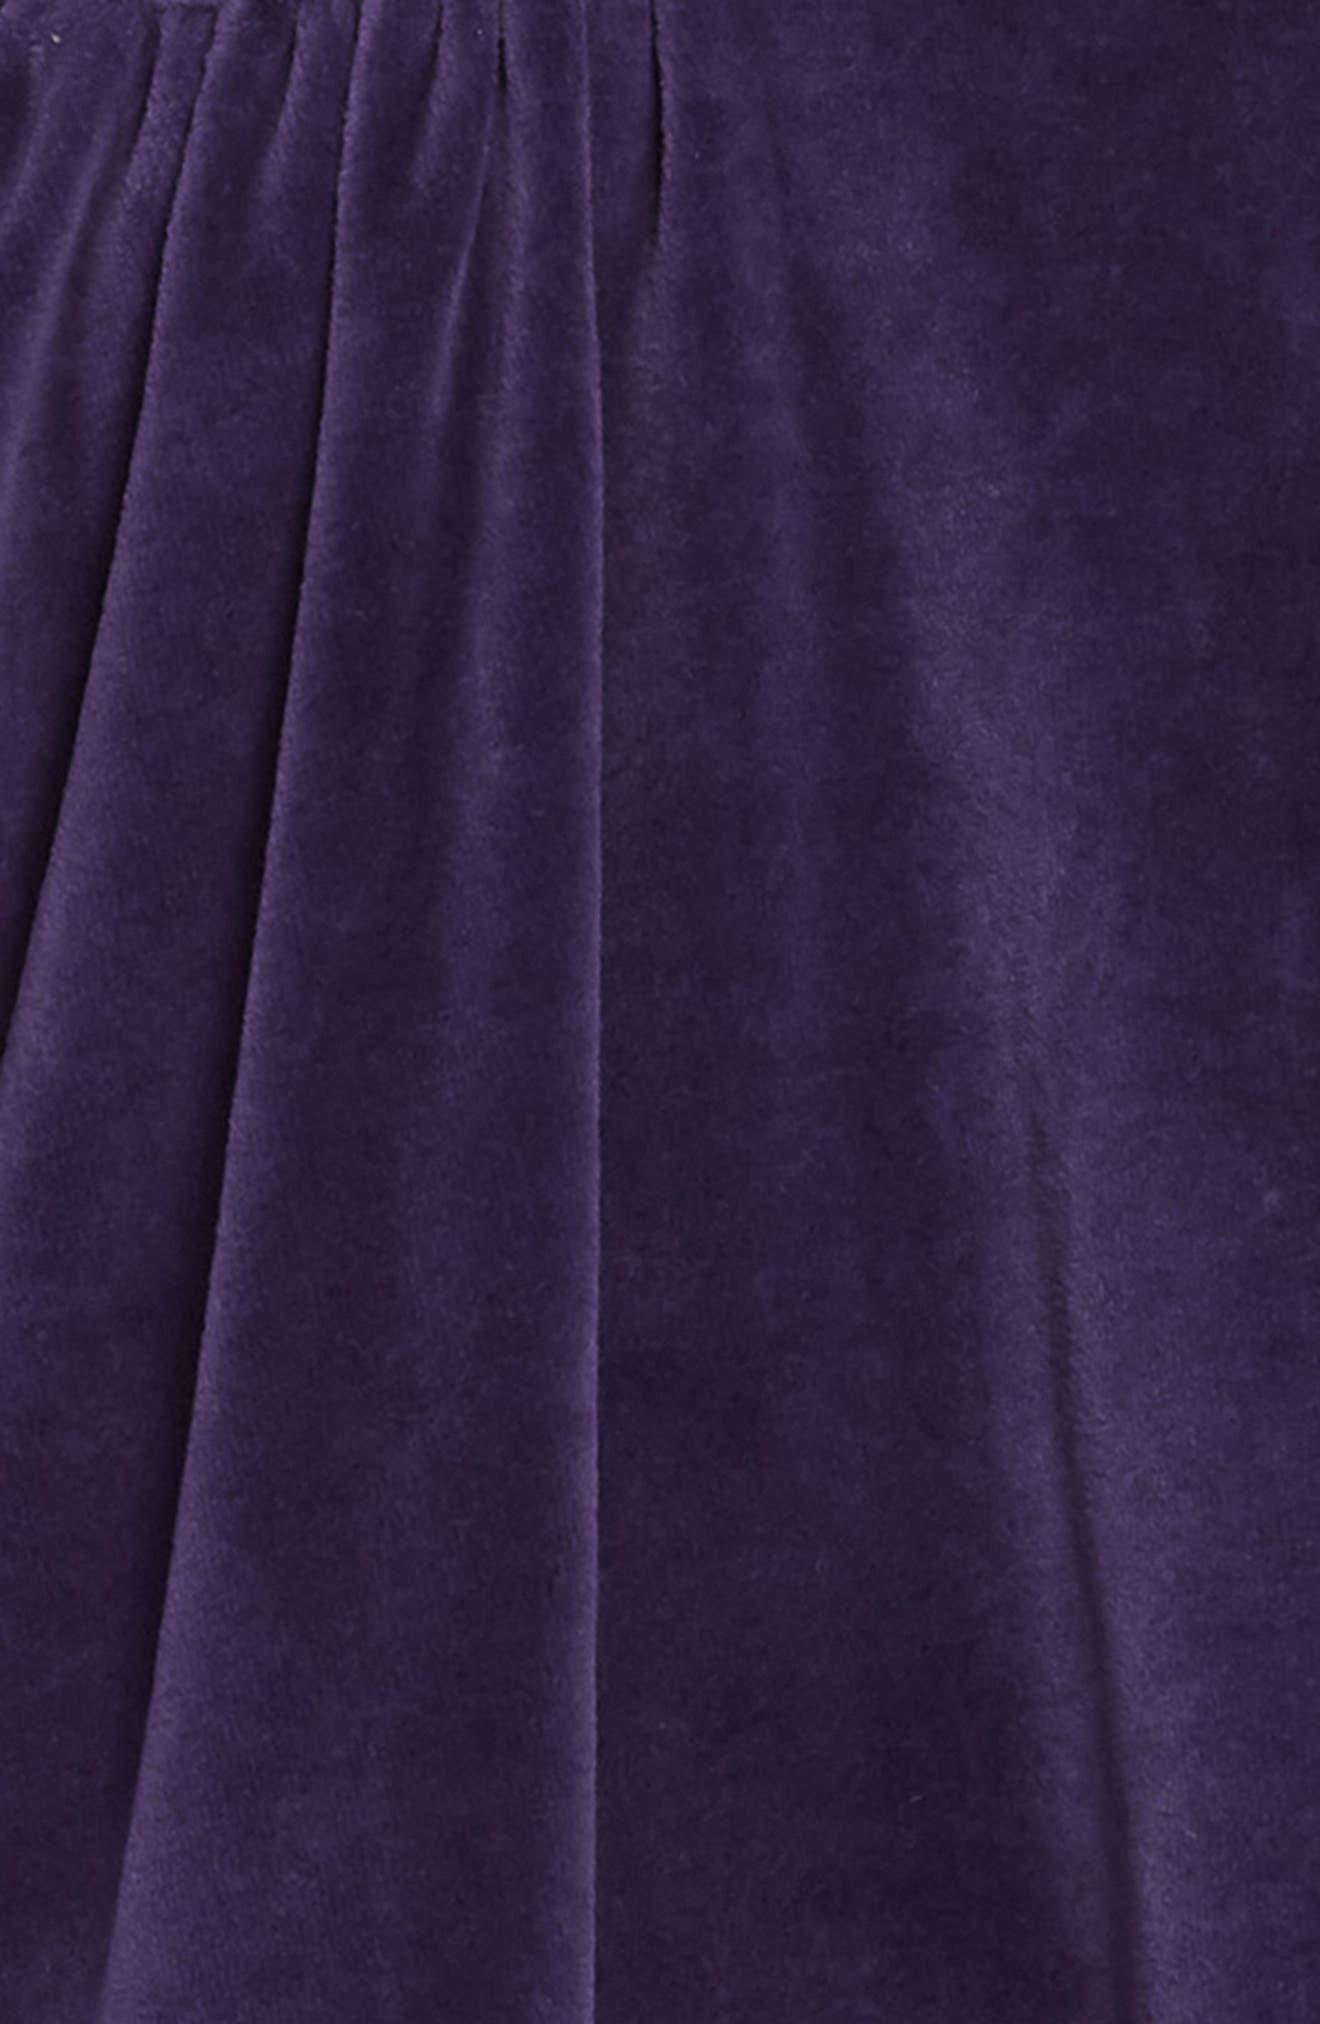 Festive Velour Dress,                             Alternate thumbnail 3, color,                             BLU PRUSSIAN BLUE